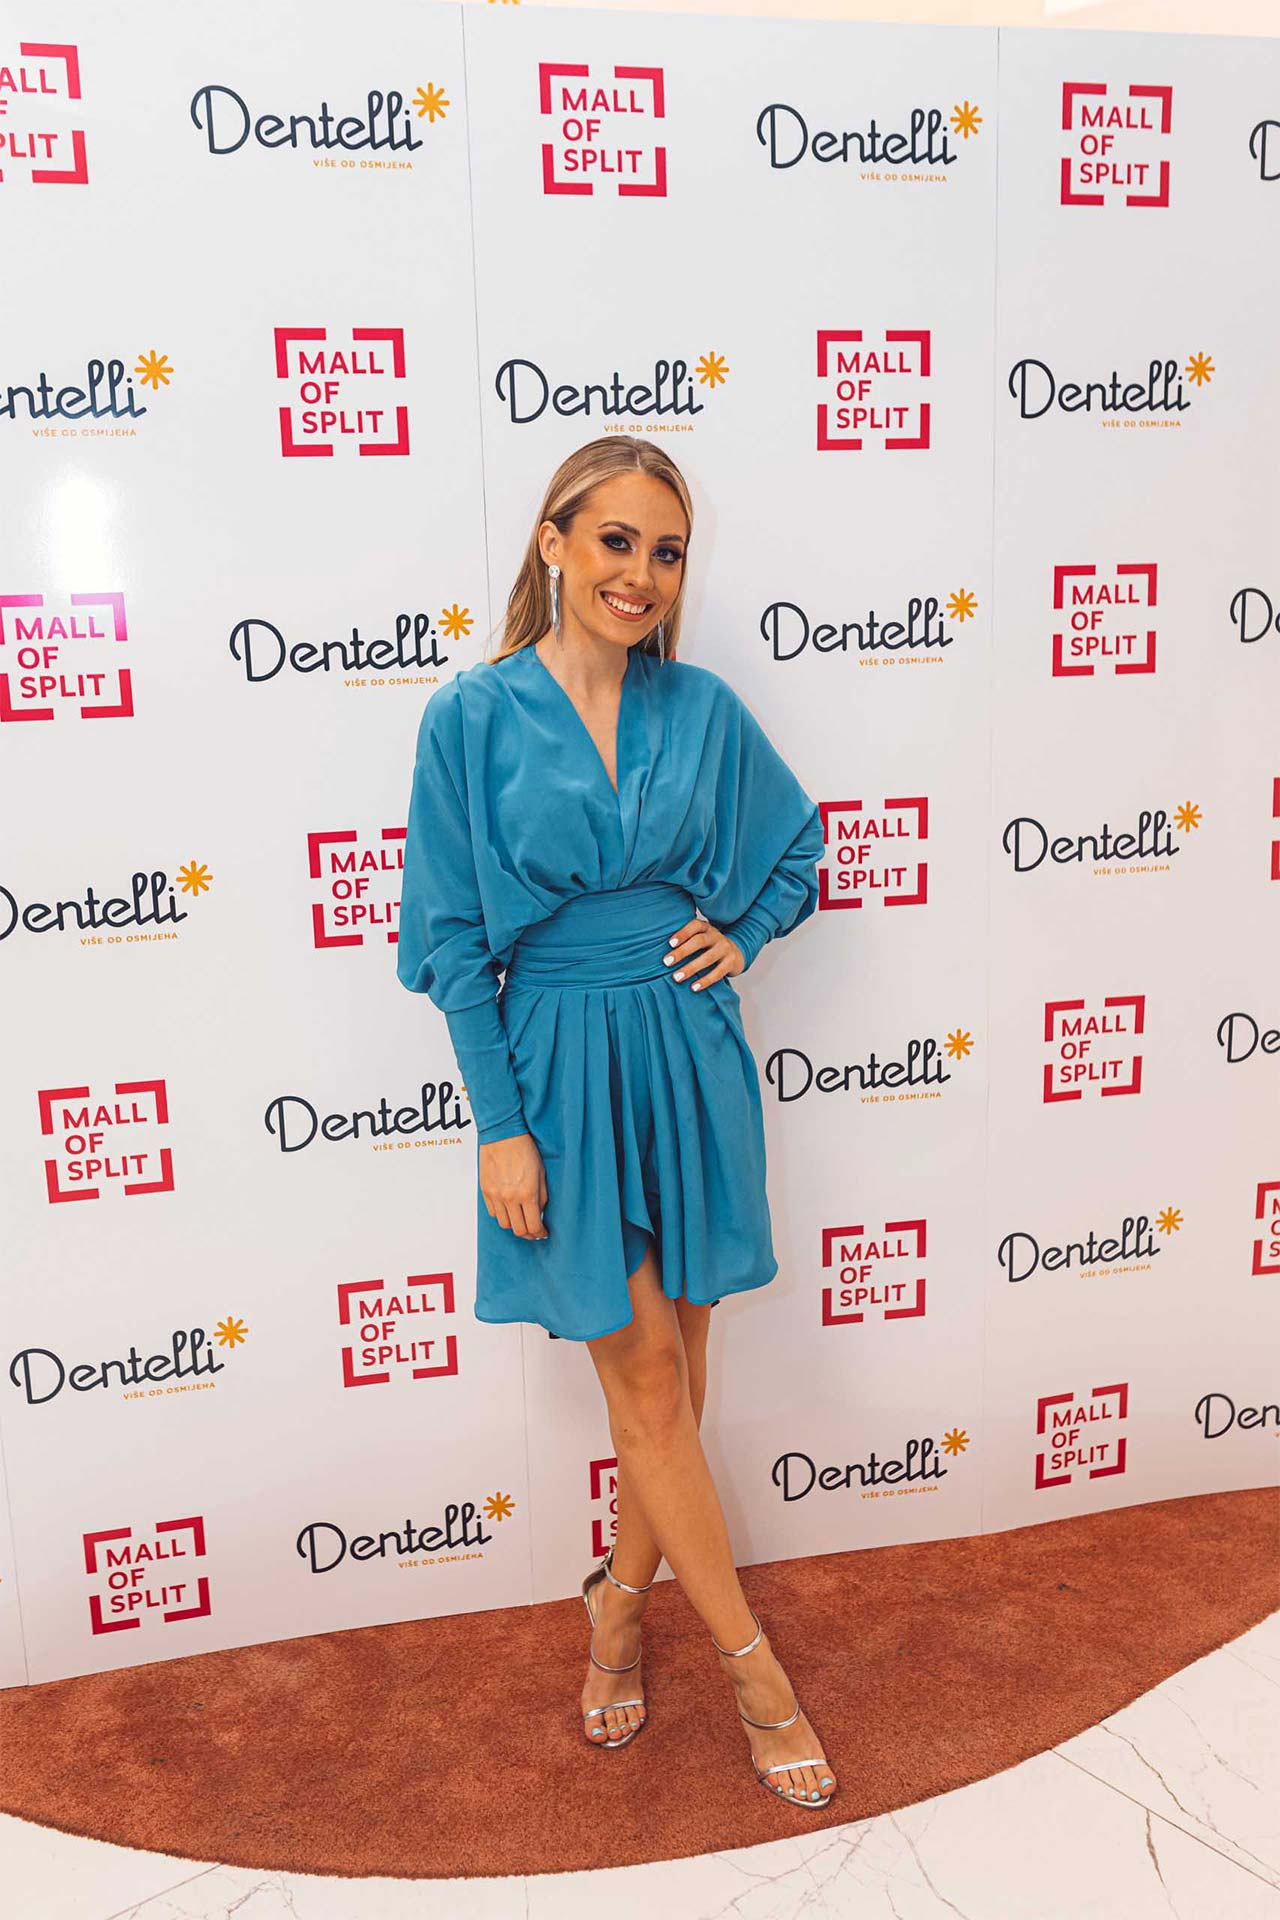 Dentelli Fashion Show - Wall of Fame (8)